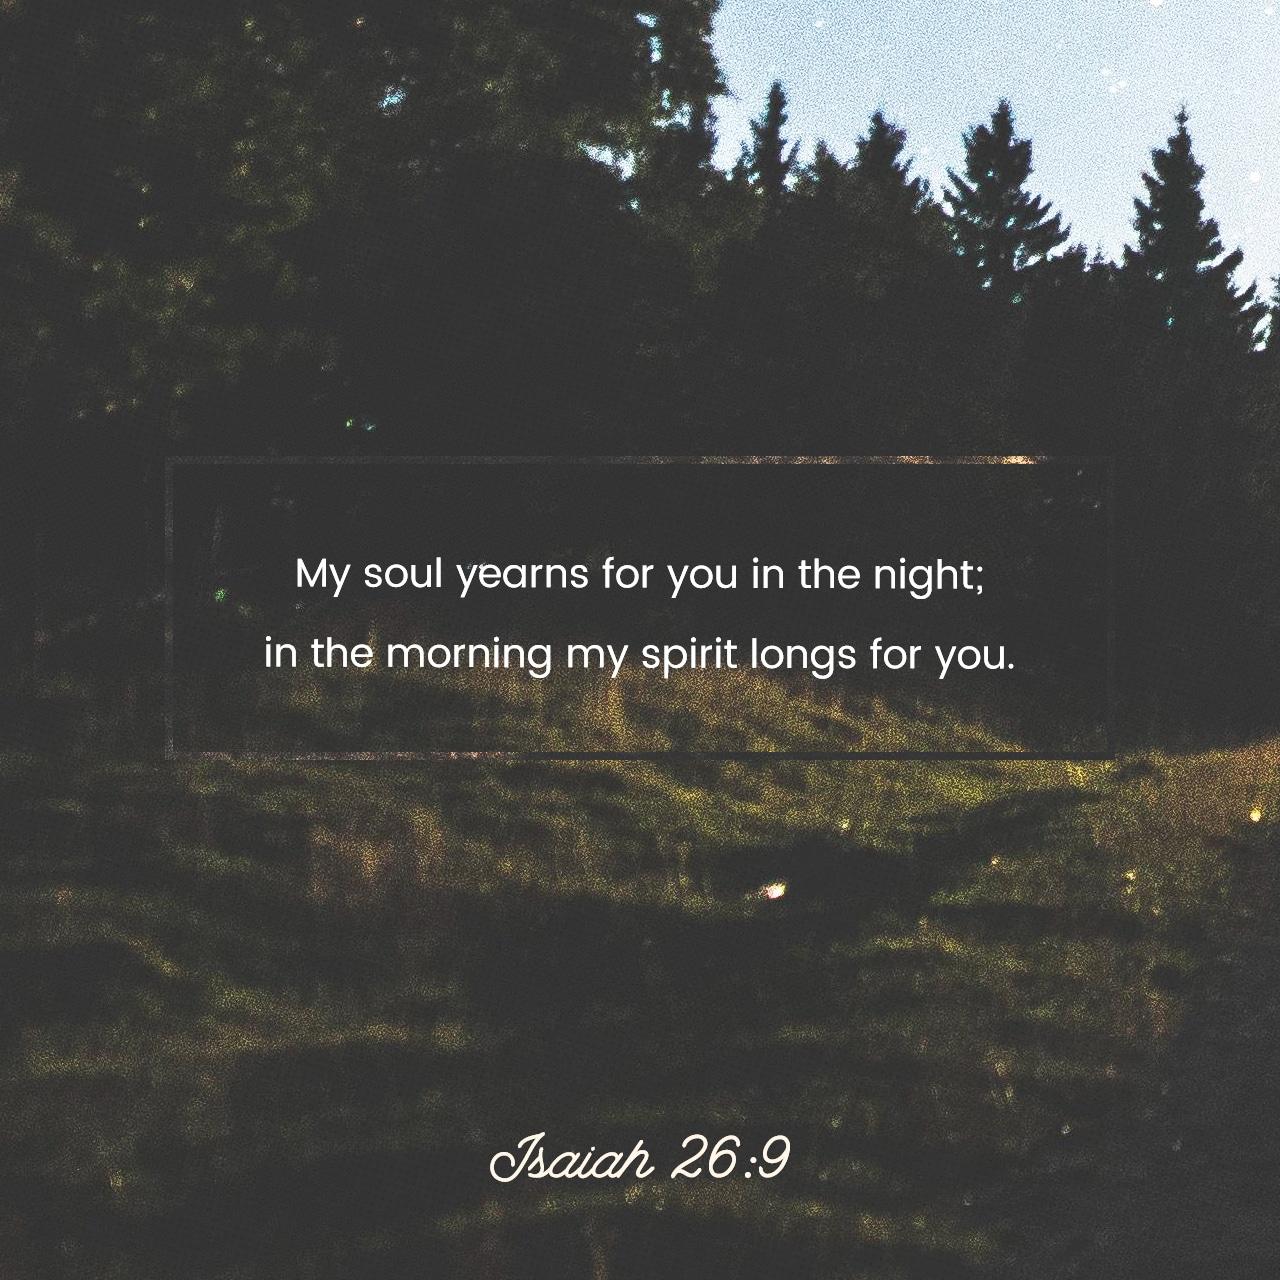 Isaiah 26:9